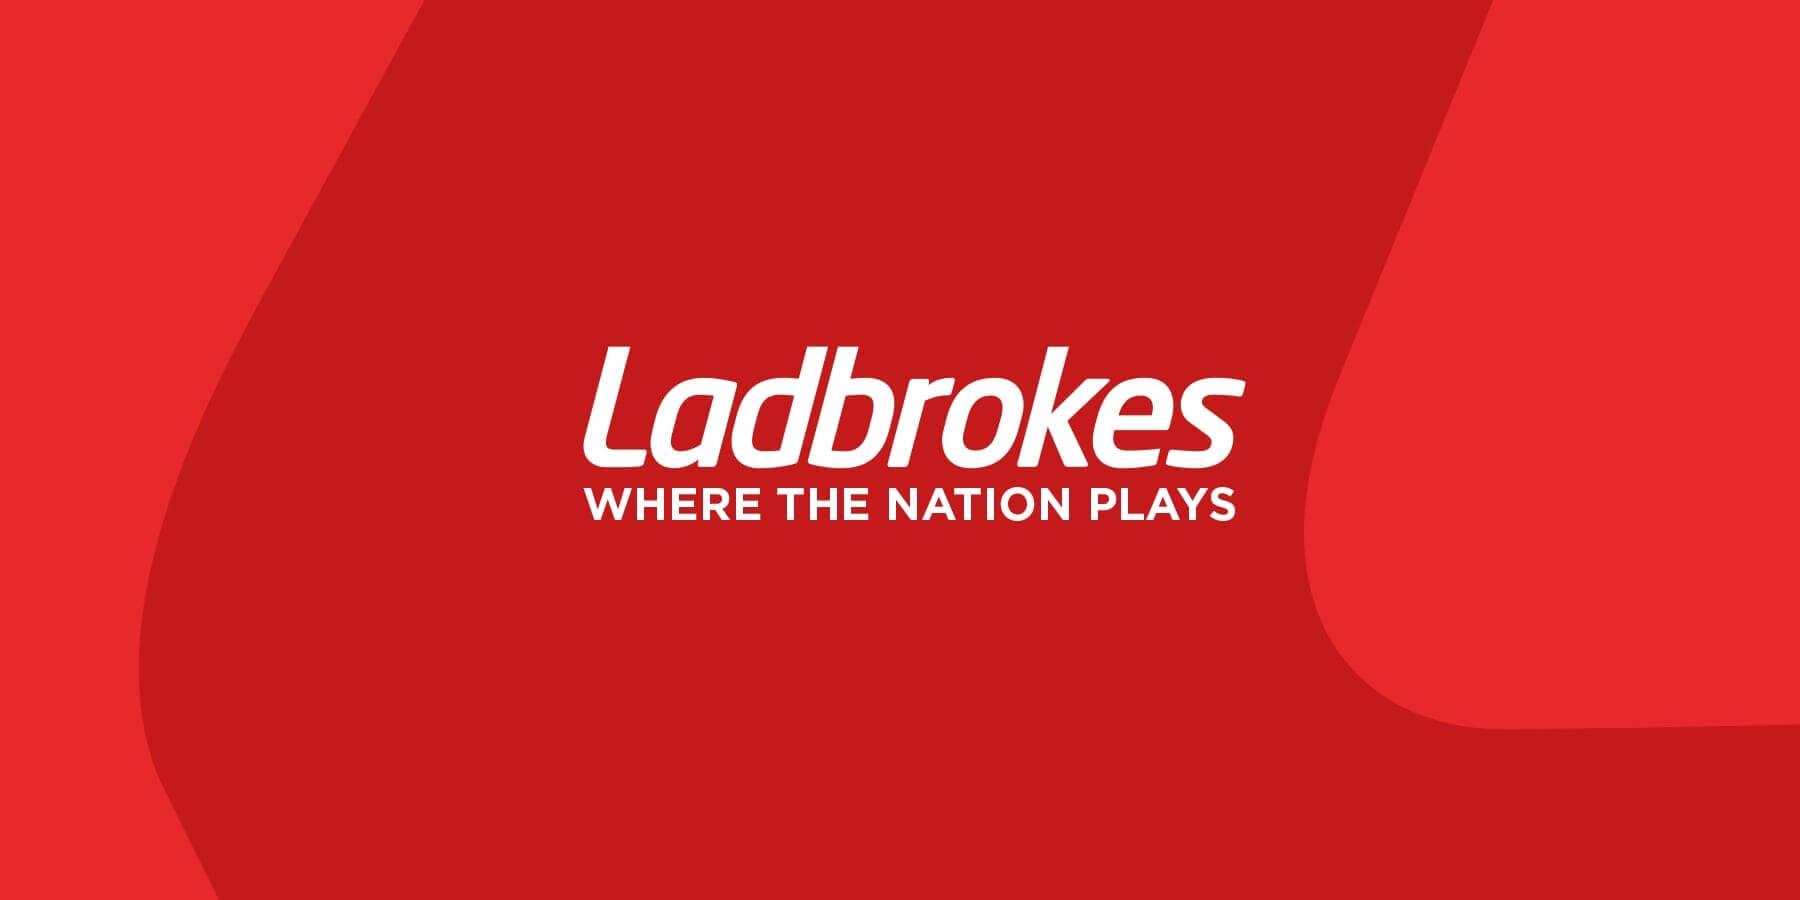 Ladbrokes Header 2 1 1800x900 1 Horse Racing Bookmakers in Australia